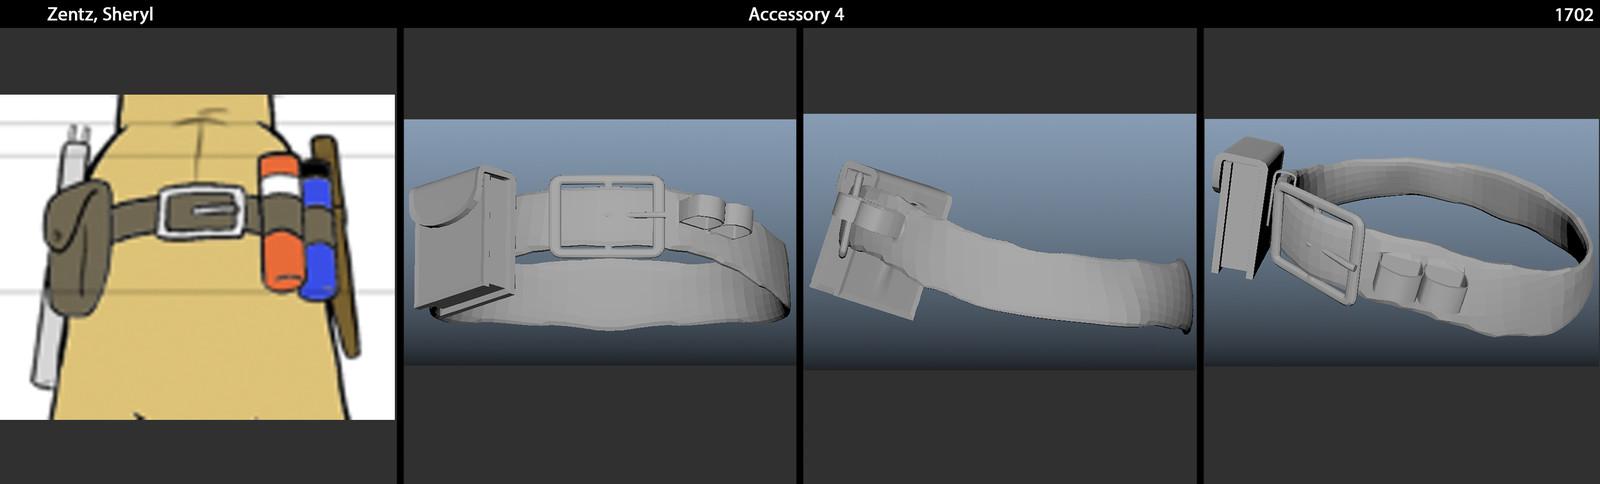 Accessory- Belt